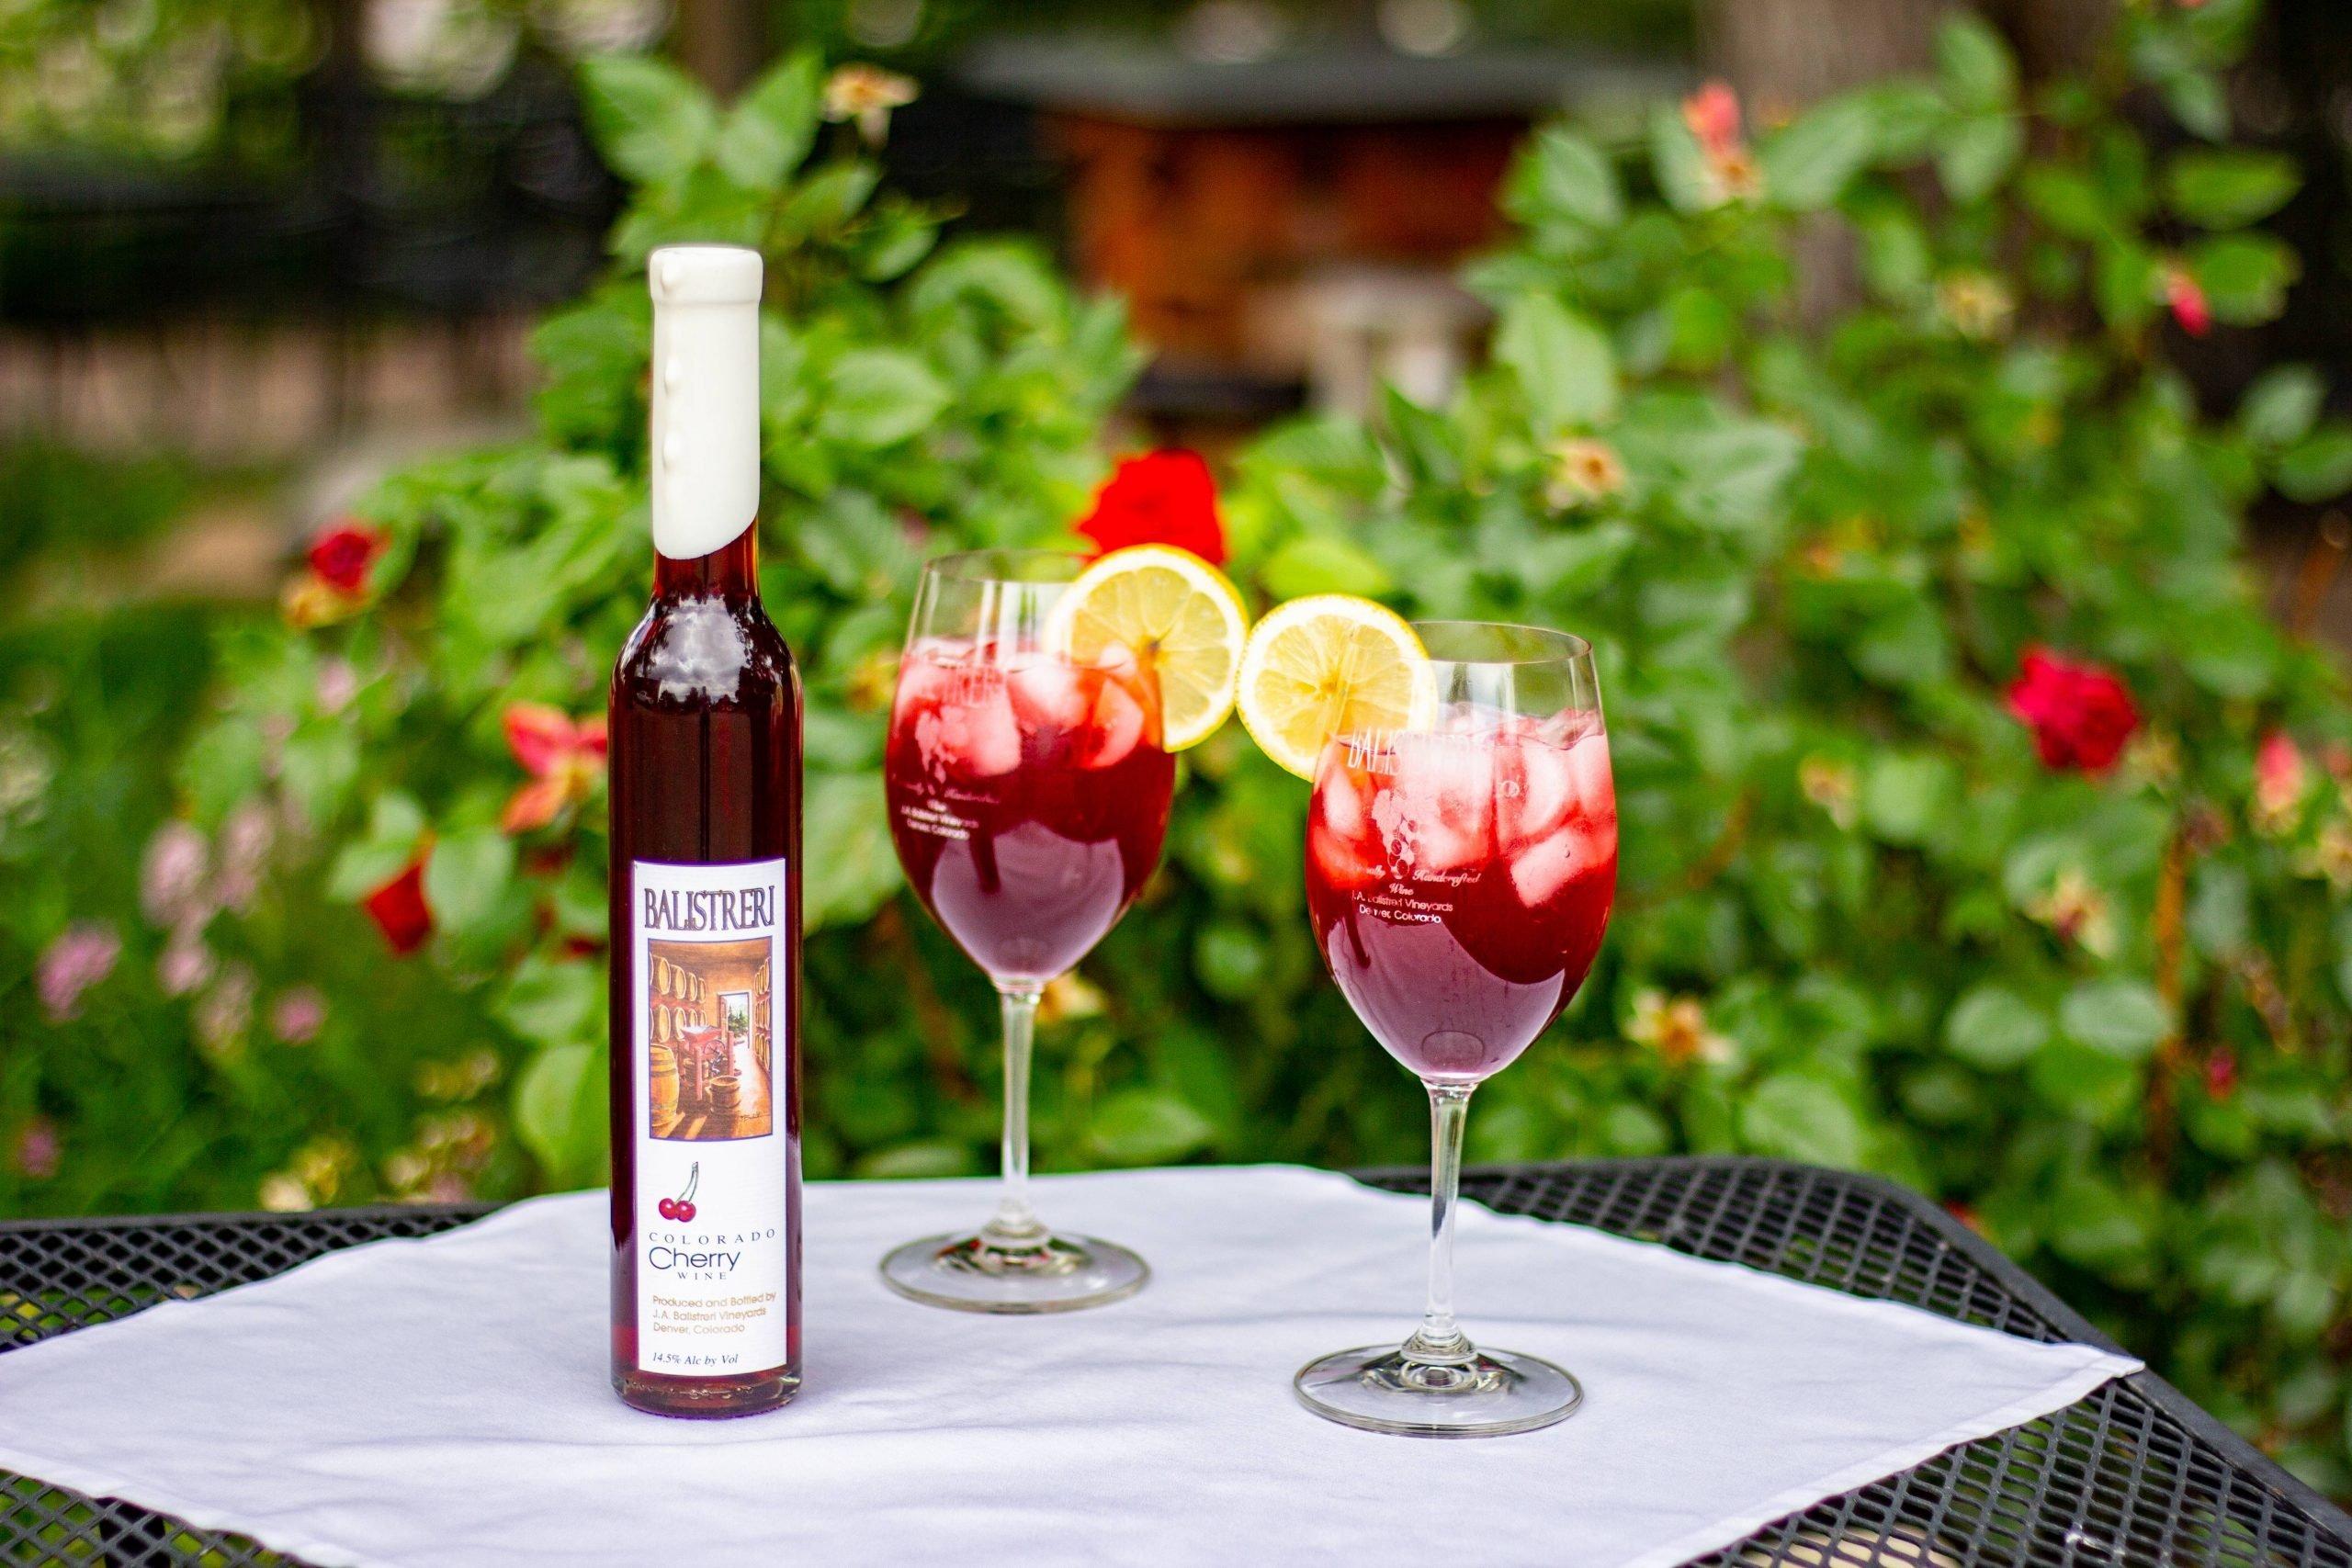 Balistreri Cherry Wine Spritzer Recipe